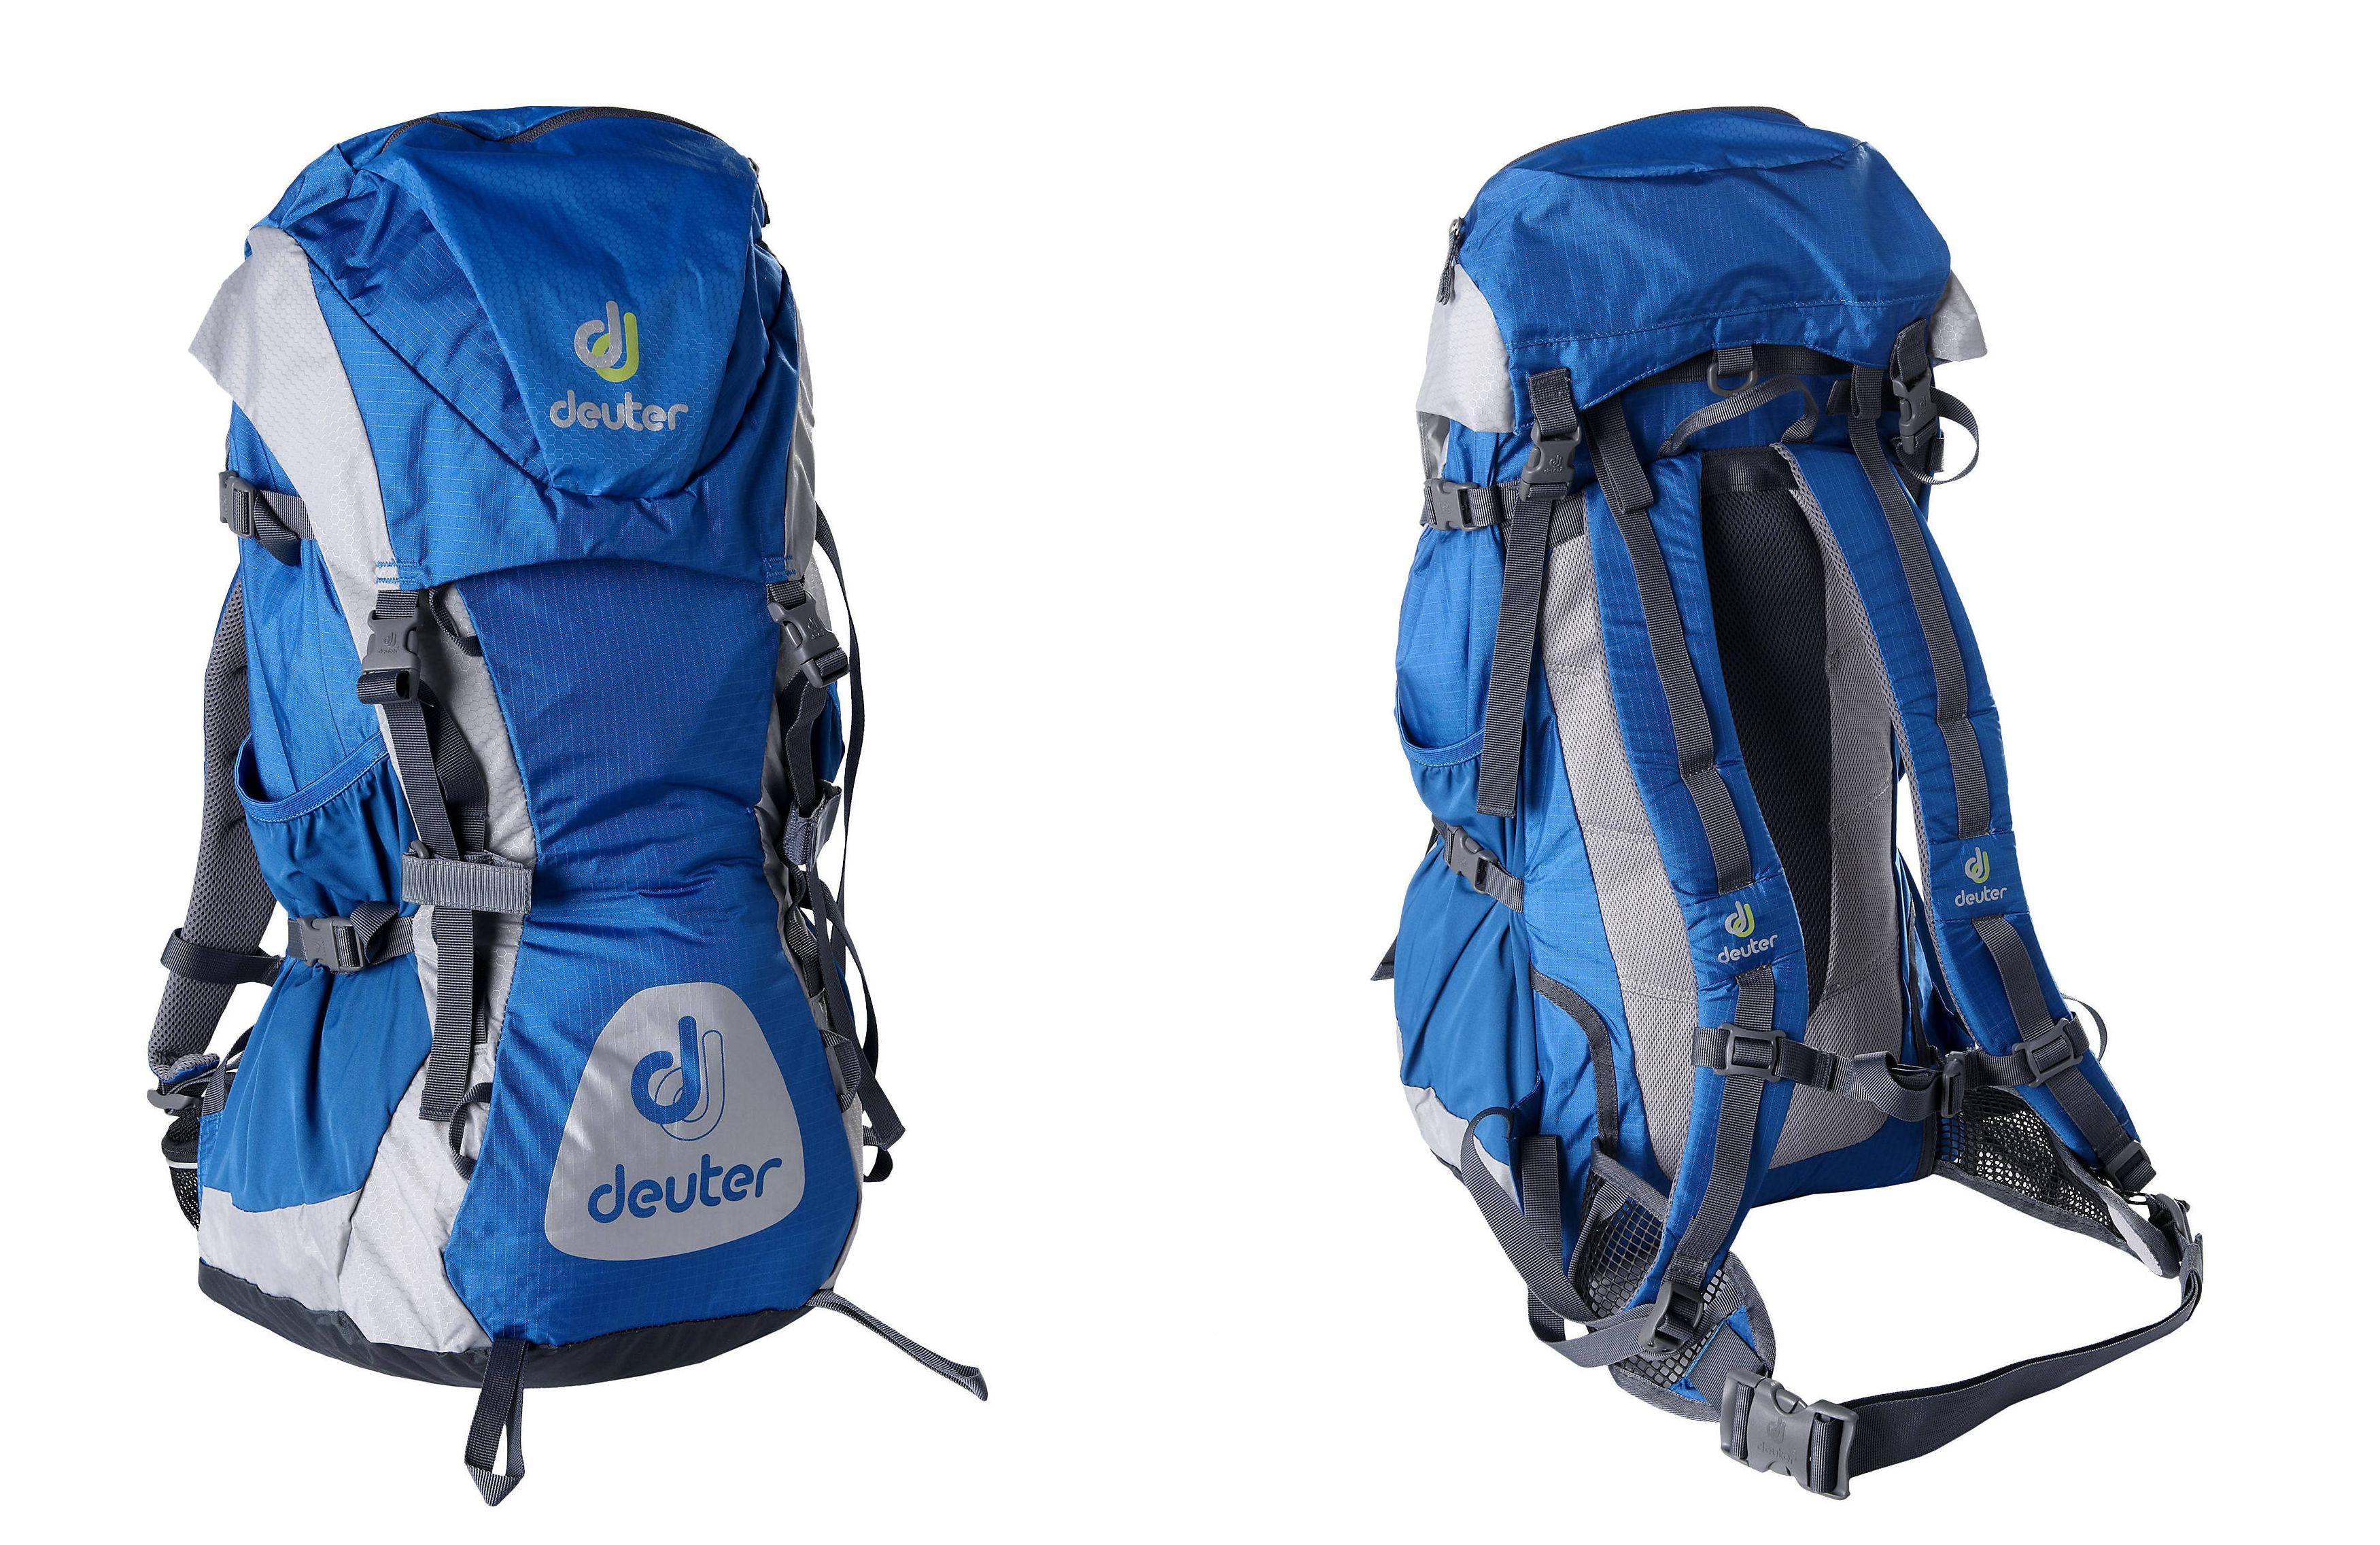 deuter-kaltenbrunner-rucksack